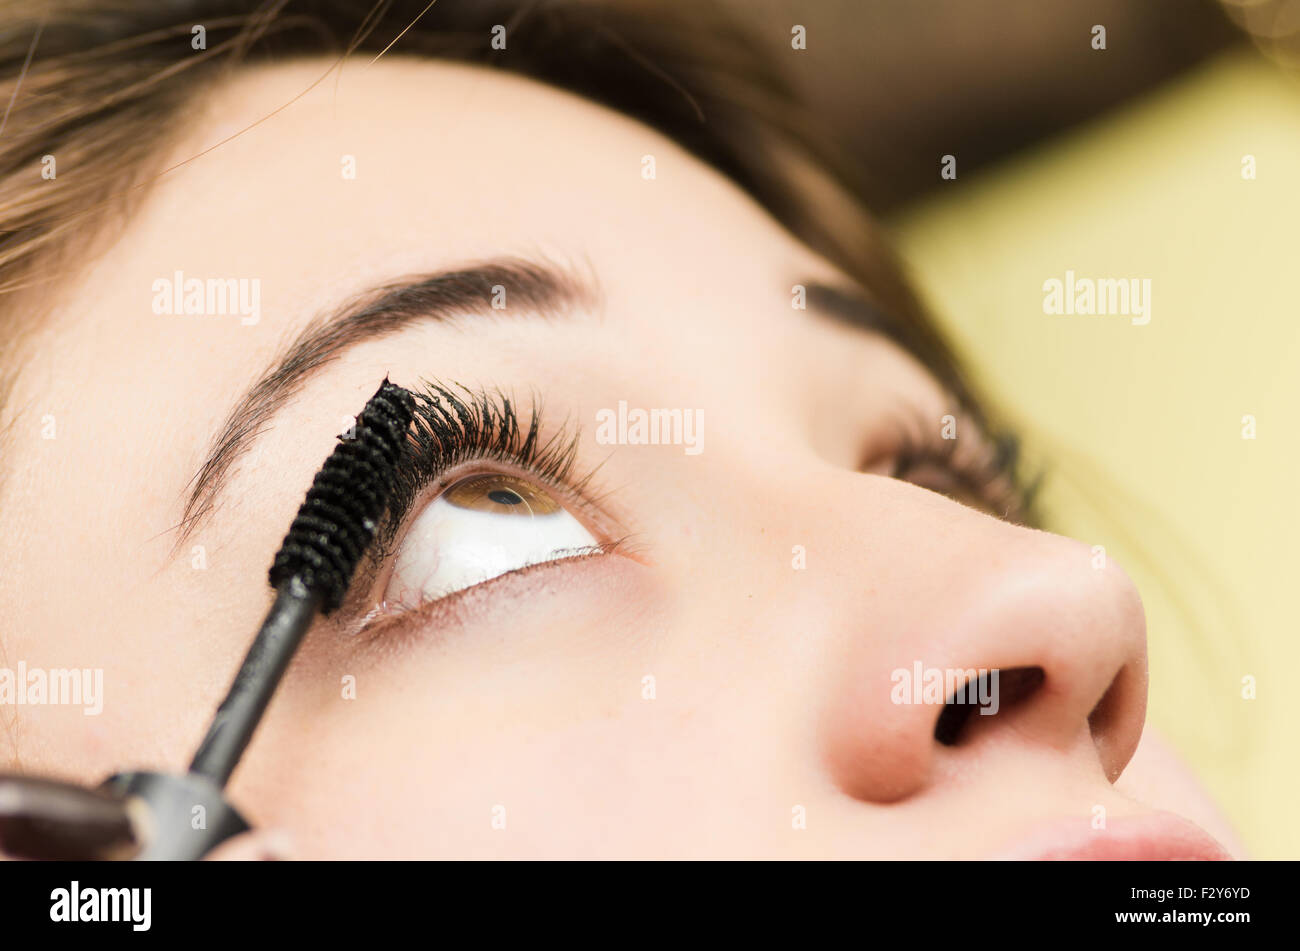 Closeup headshot brunette getting makeup treatment by professional stylist applying mascara on eyelashes - Stock Image